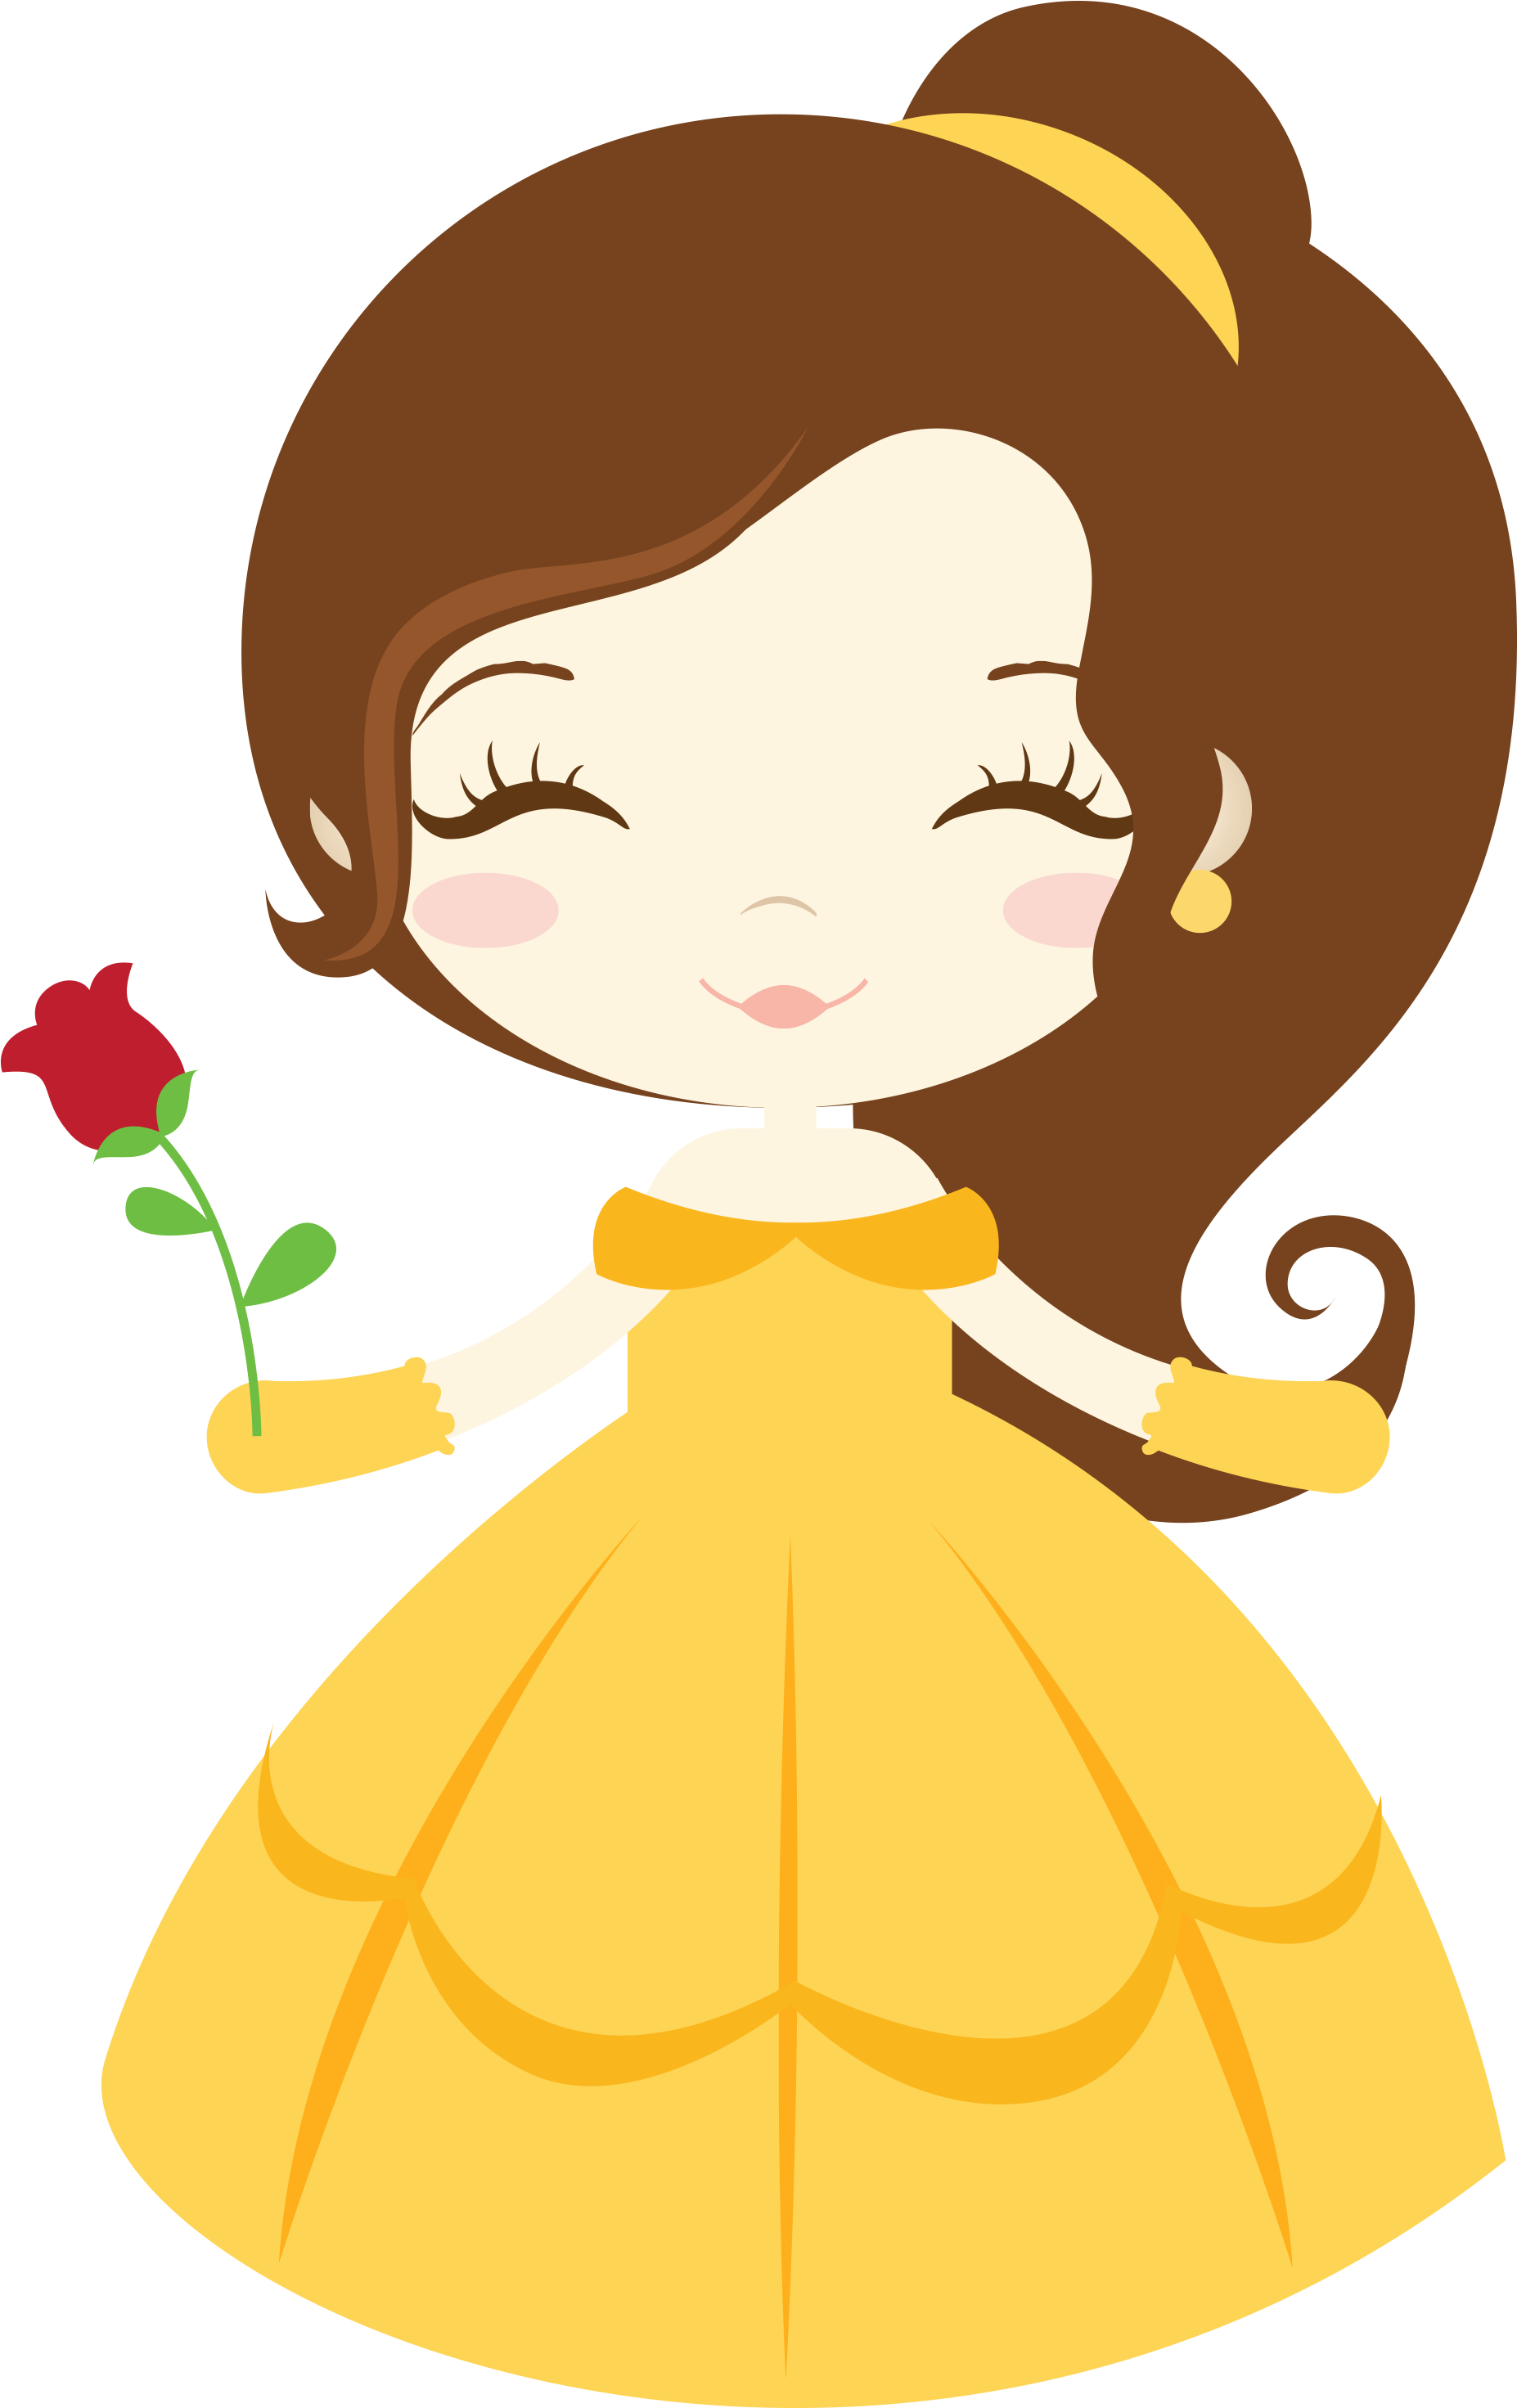 Open Full Size Publicado Por Princesas Beast Cute Disney Princess Clipart Download Tra In 2021 Disney Princess Theme Disney Princess Invitations Disney Princess Png